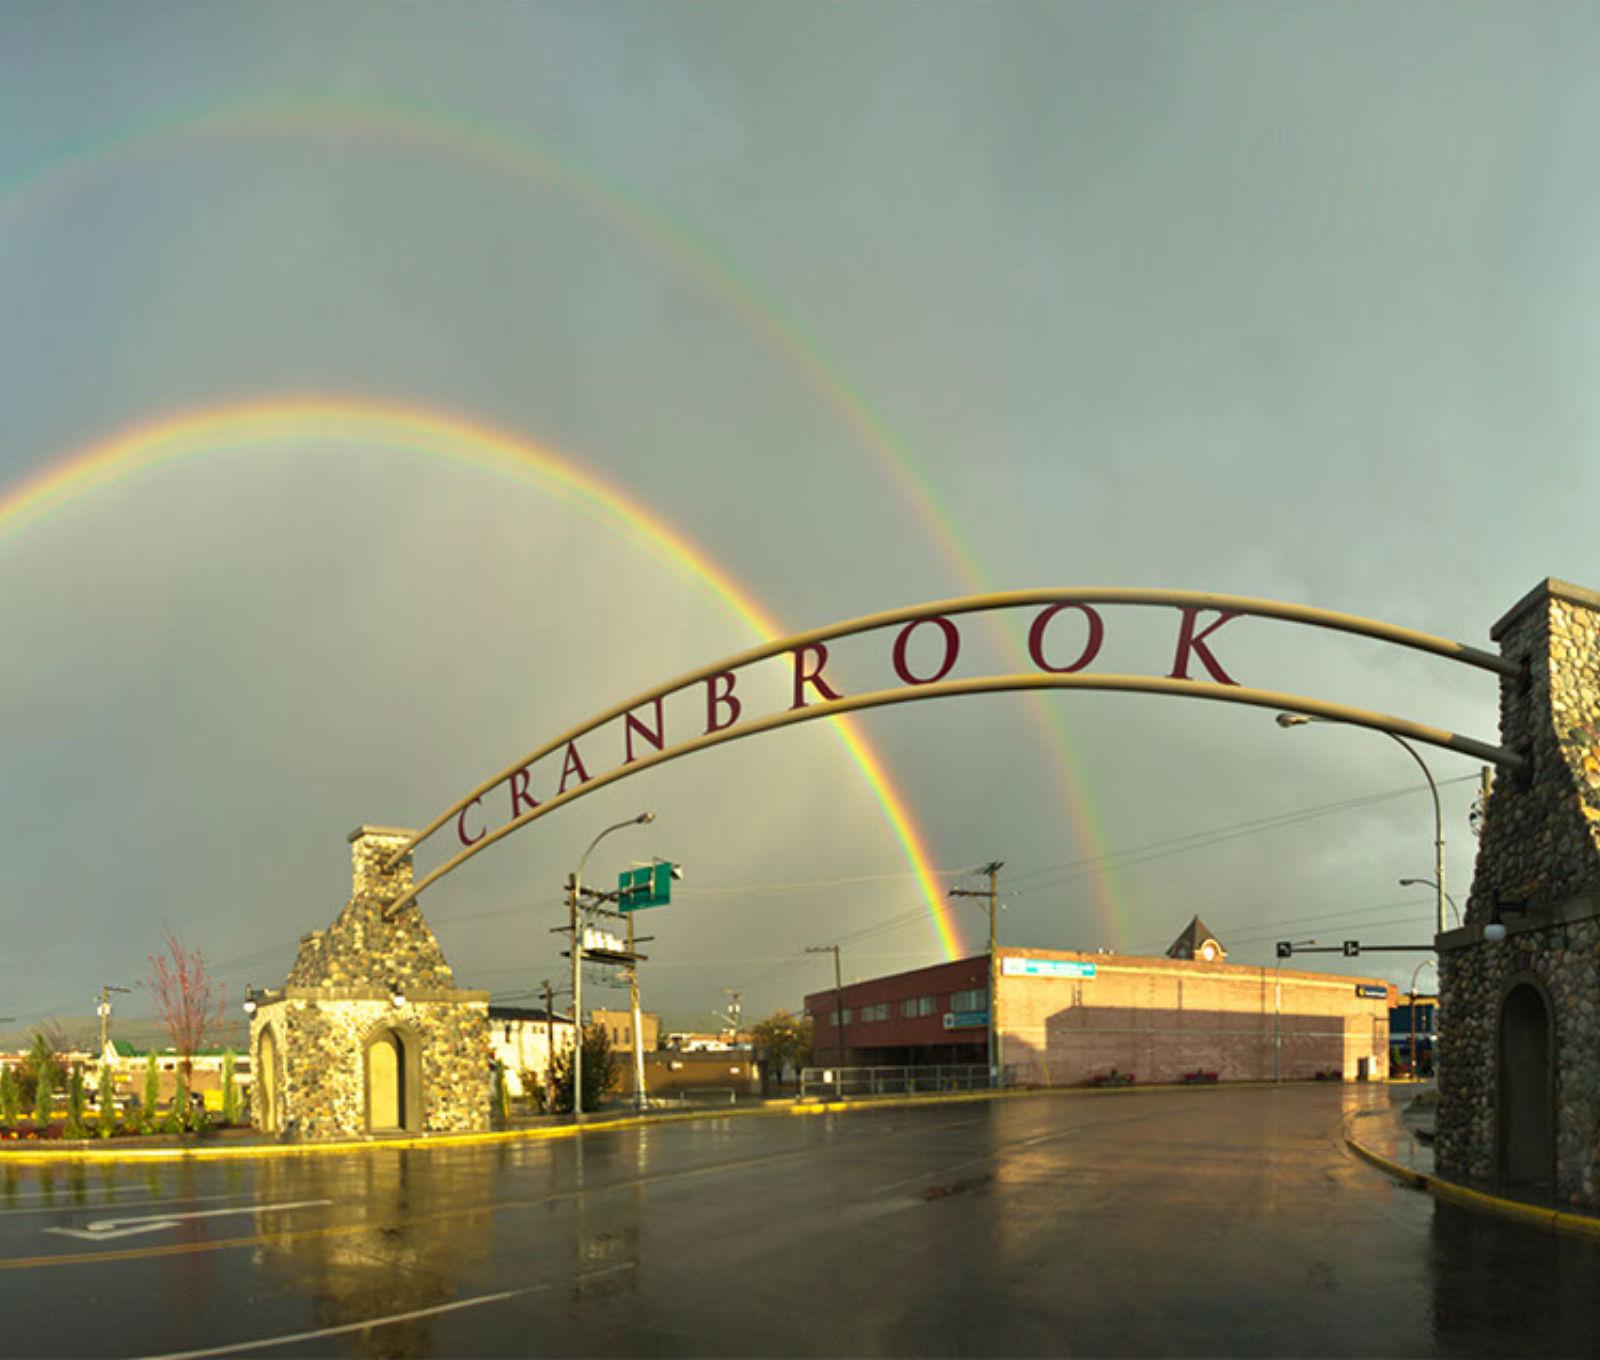 cranbrook-rainbow-1600x1360.jpg